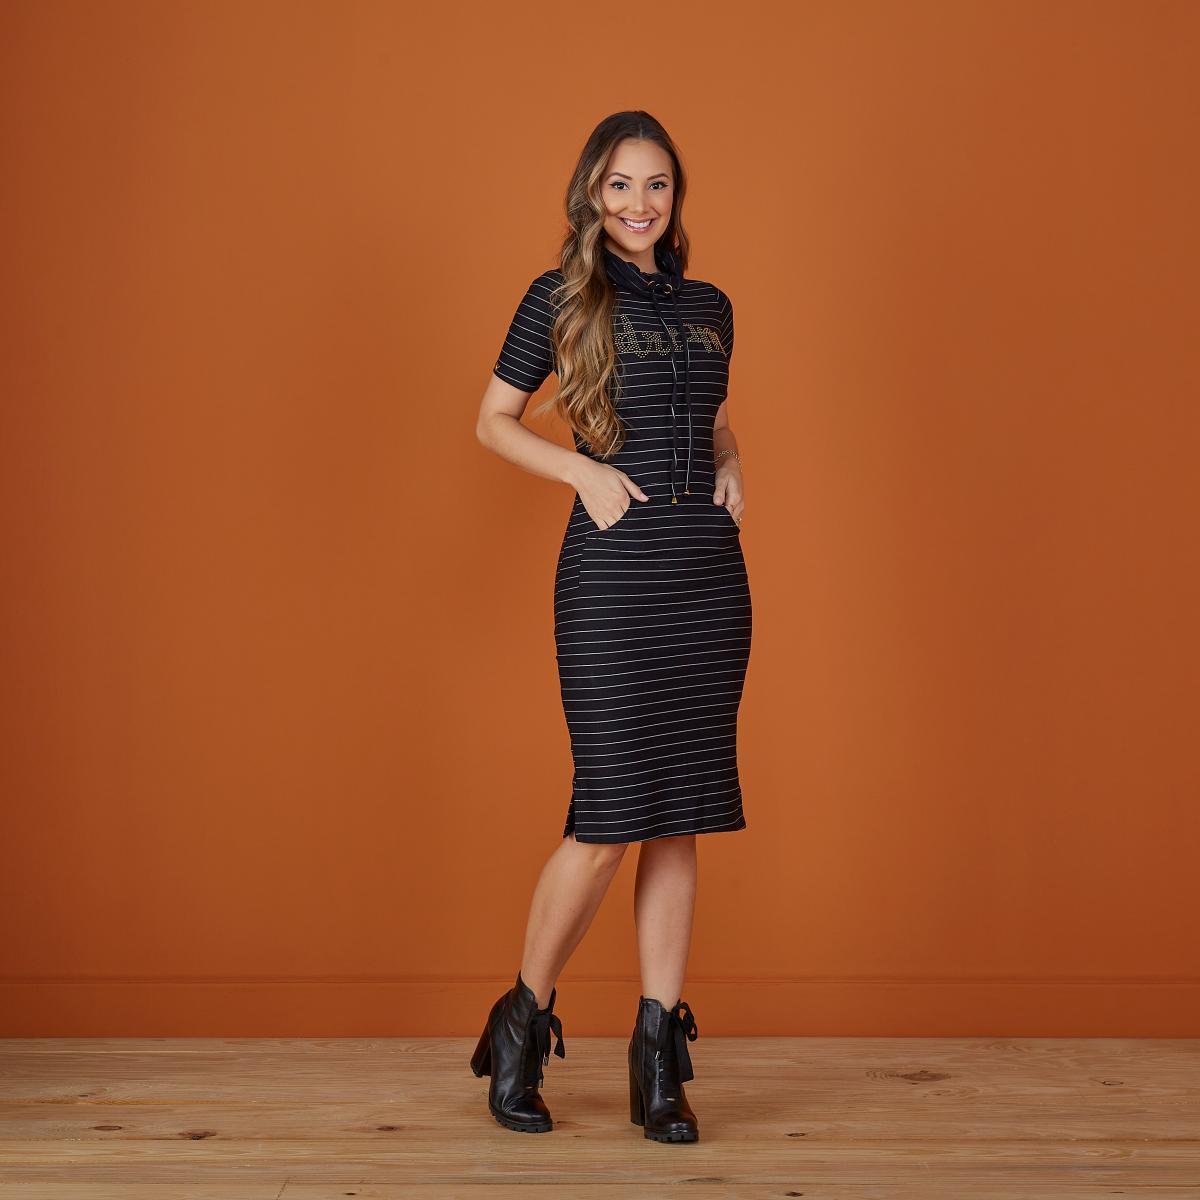 Vestido Melissa Gola Alta Oversized, Moda Evangélica - Tatá Martello